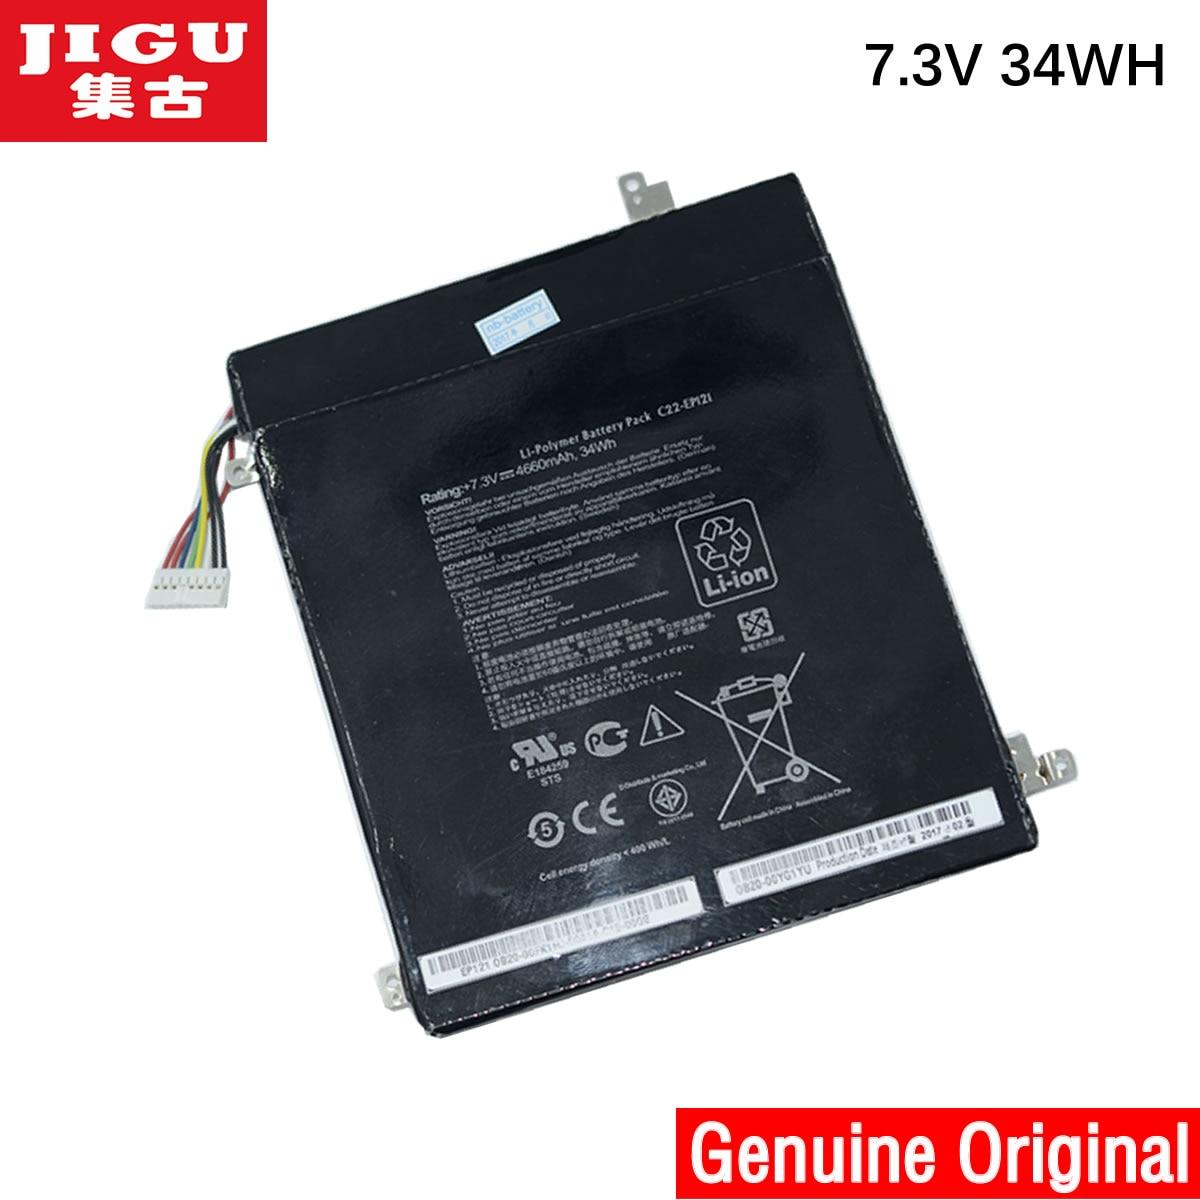 Batería Original para ordenador portátil JIGU C22-EP121 para ASUS para Eee Pad B121 tableta Serie PC pizarra EP121 B121-A1 EP121